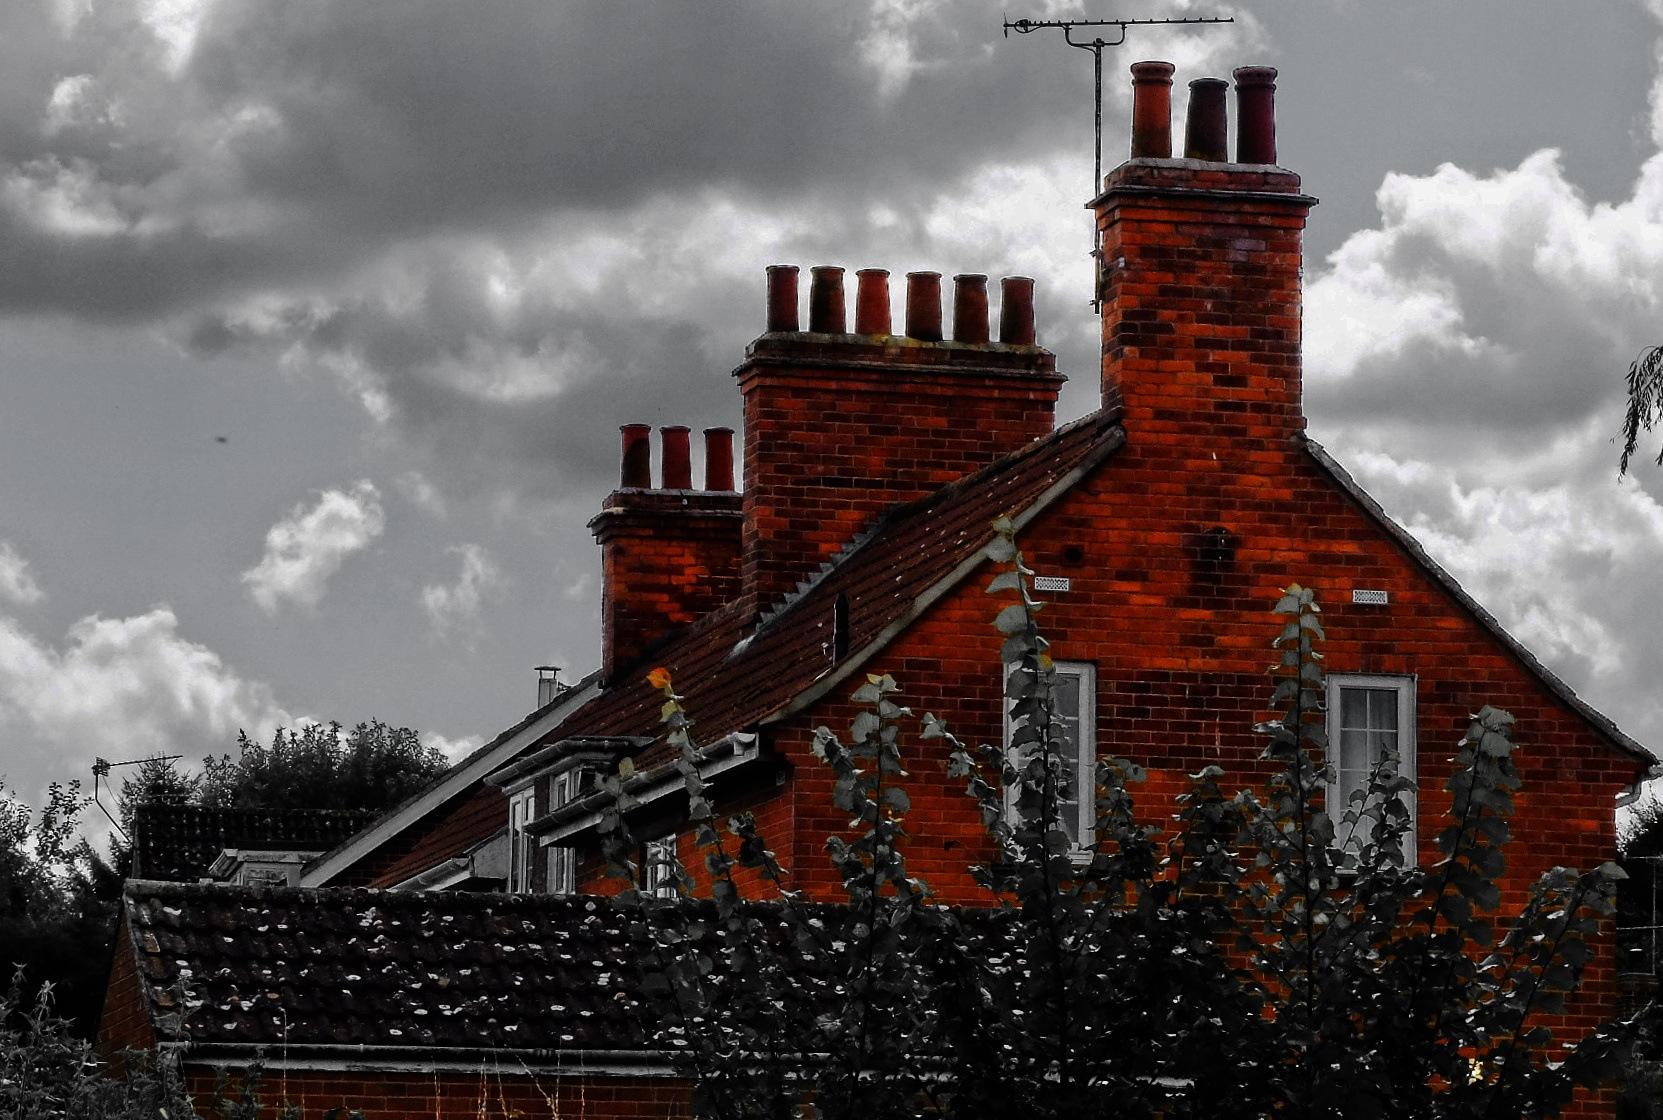 Chimney Pots - Patney Road by Keith Patrak